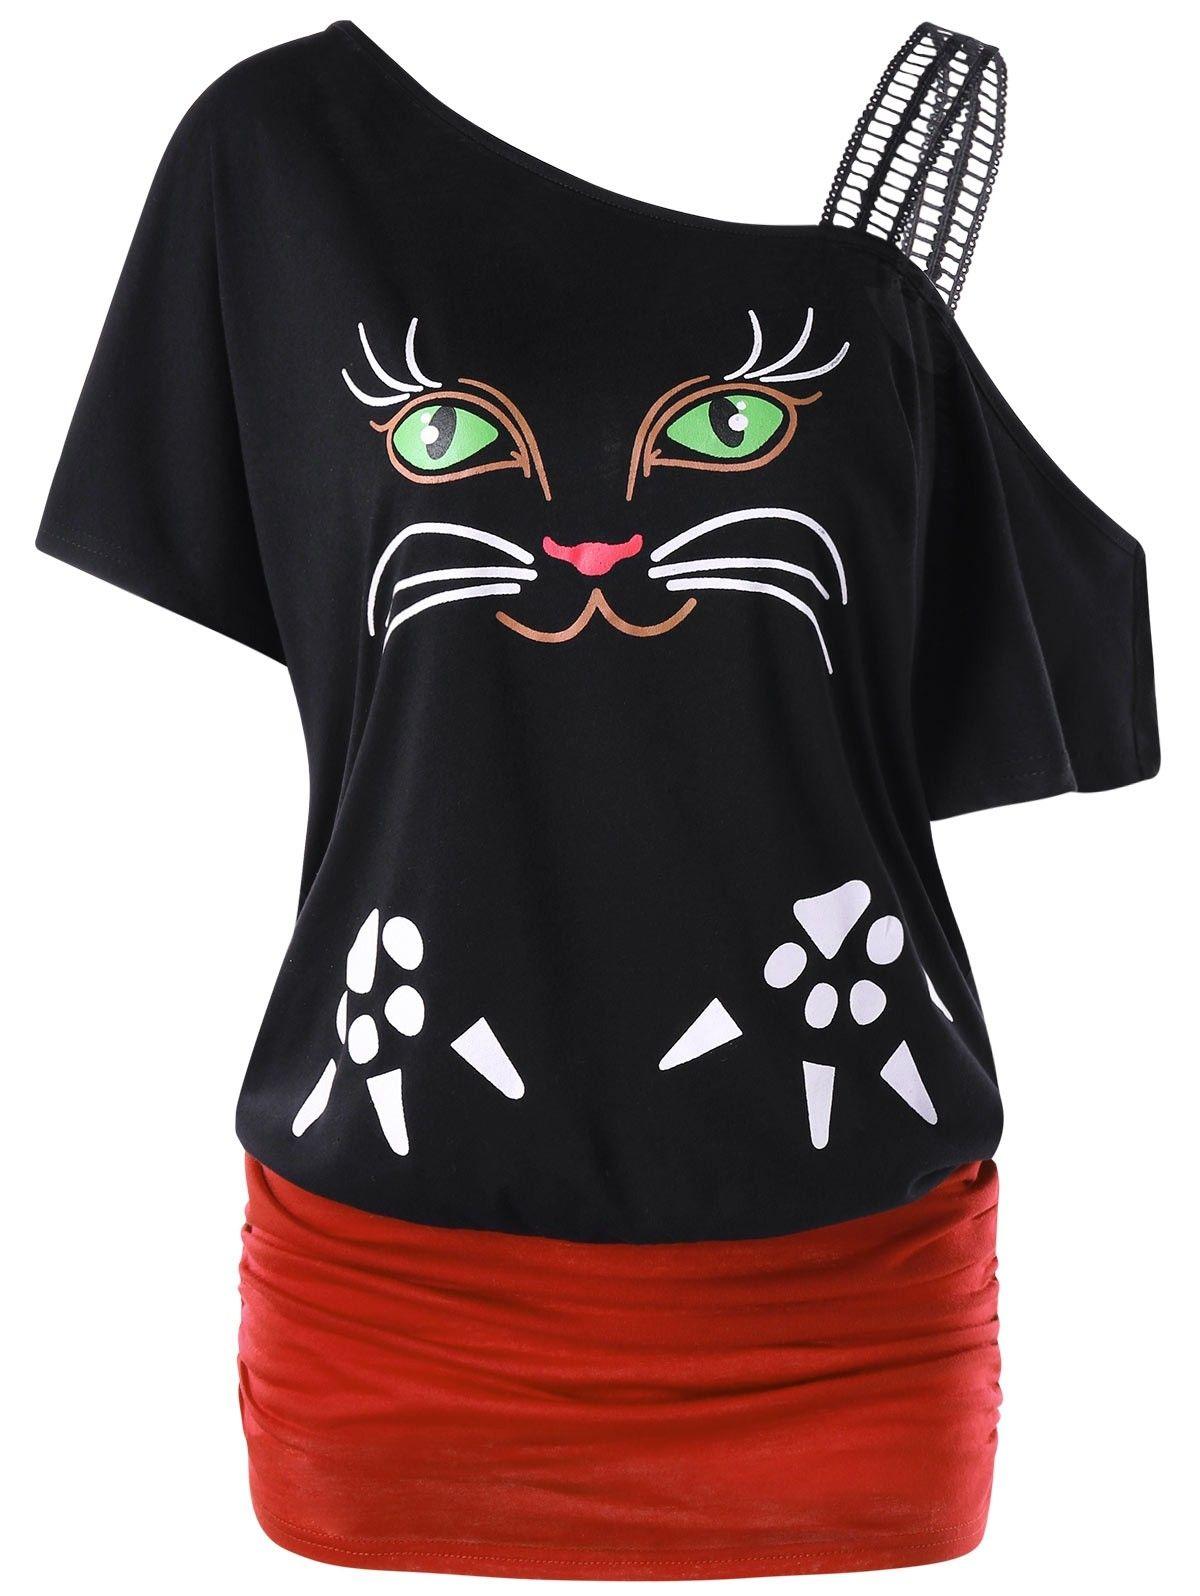 Cat Print Skew Collar Tunic Tshirt Black 3H40156212